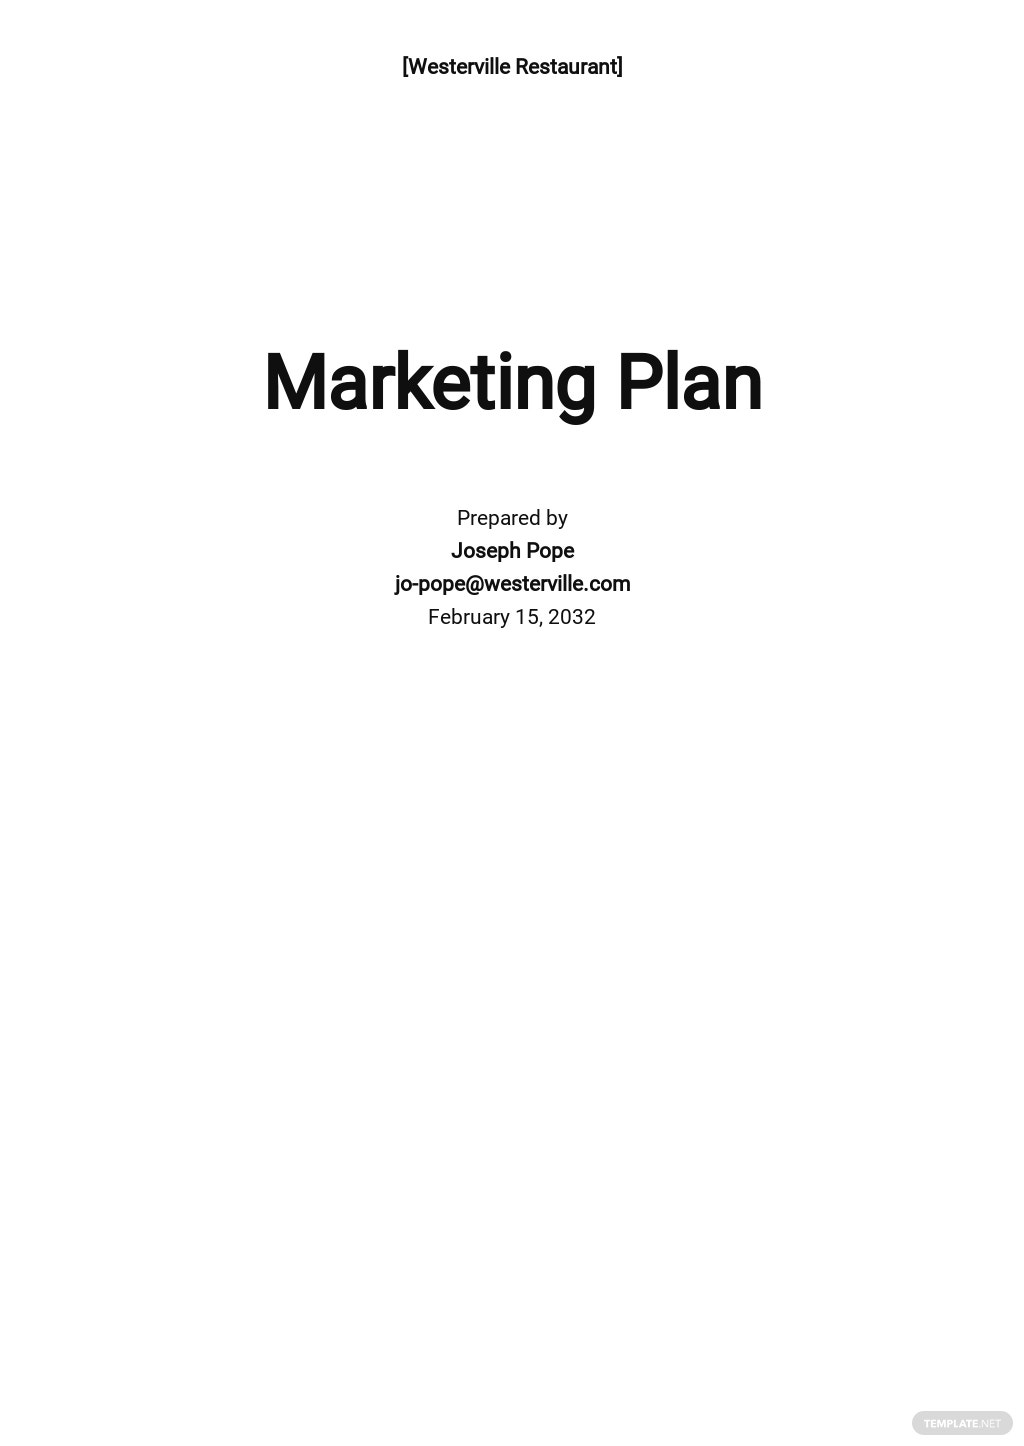 Restaurant Opening Marketing Plan Template